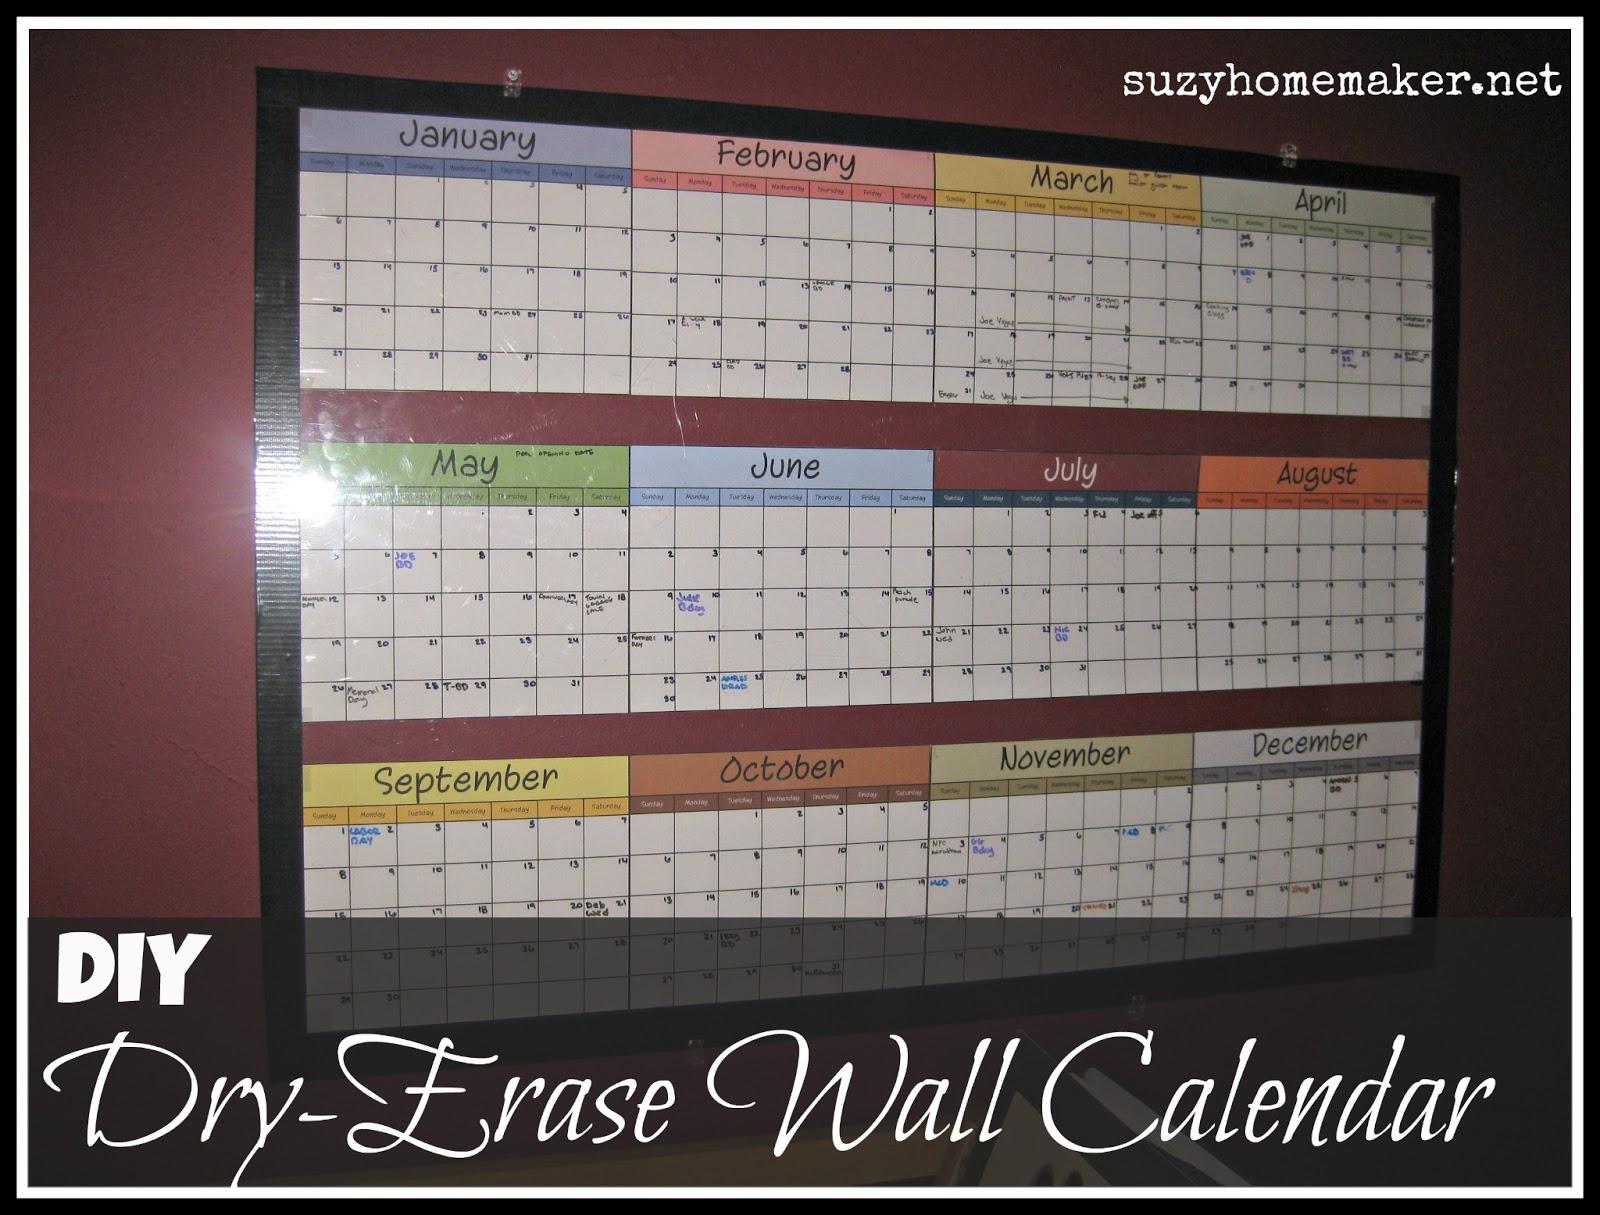 diy dry erase wall calendar suzyco